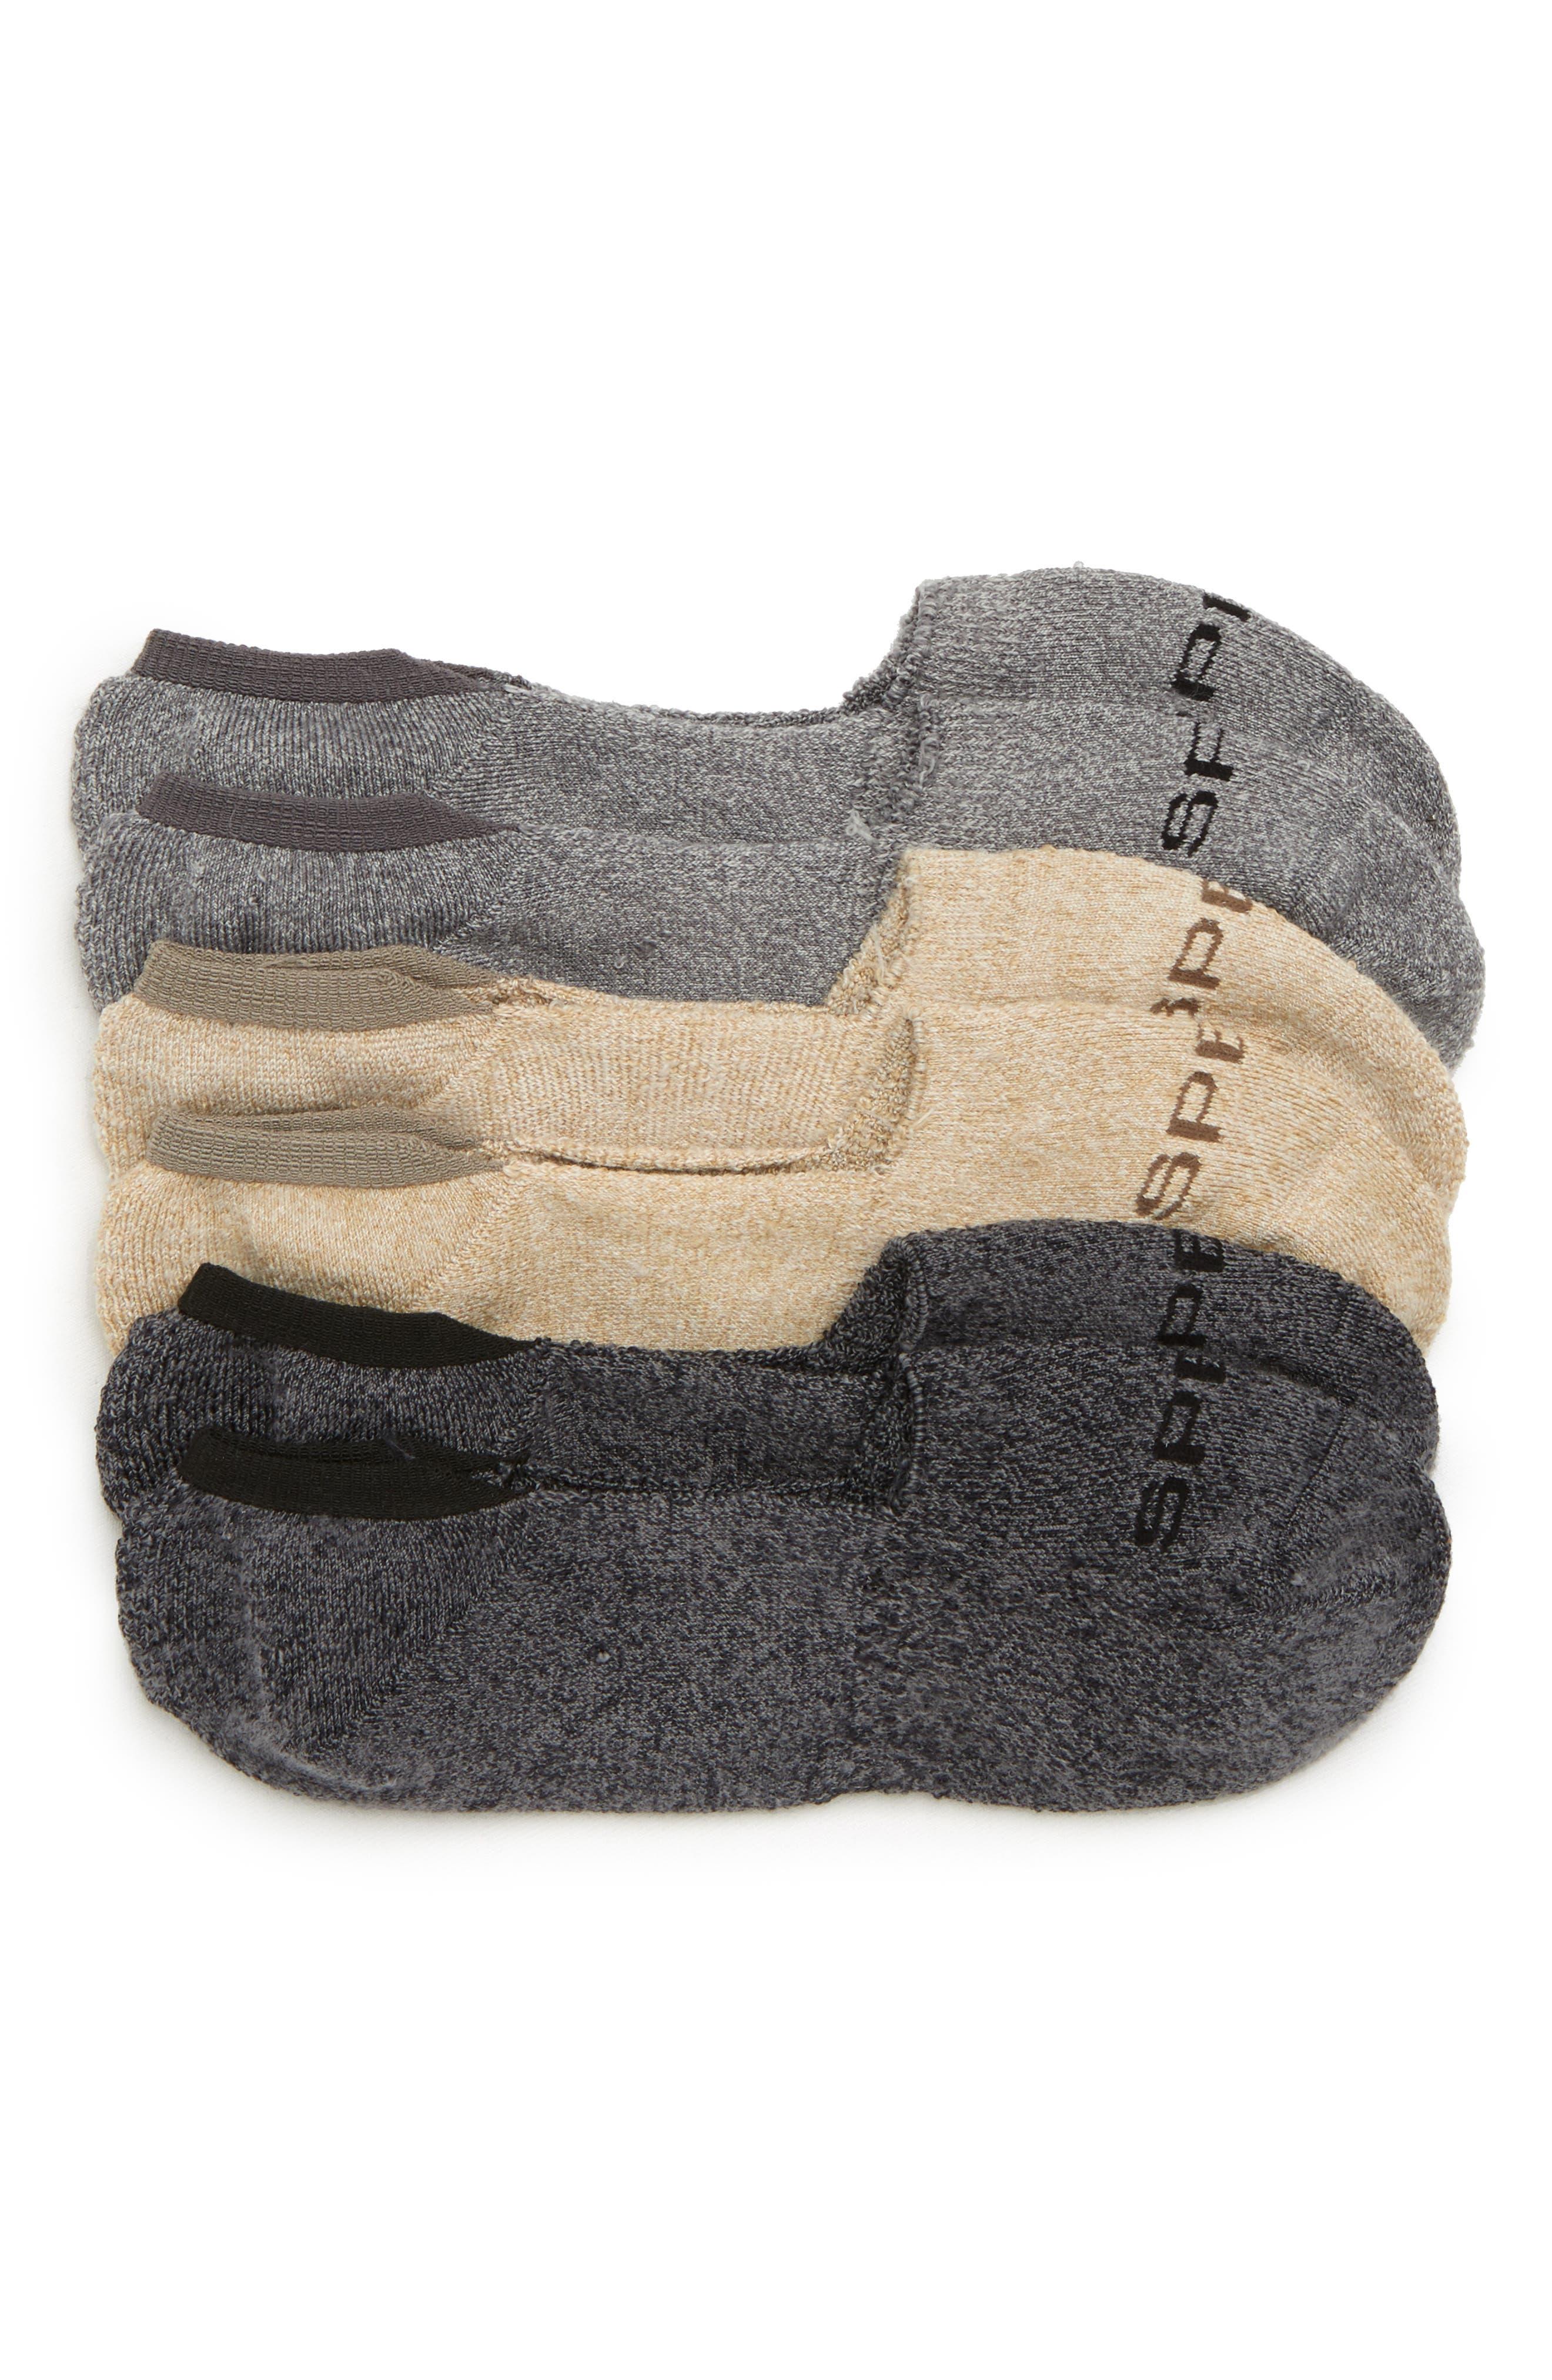 Top-Sider 3-Pack Microfiber Liner Socks,                             Main thumbnail 1, color,                             060